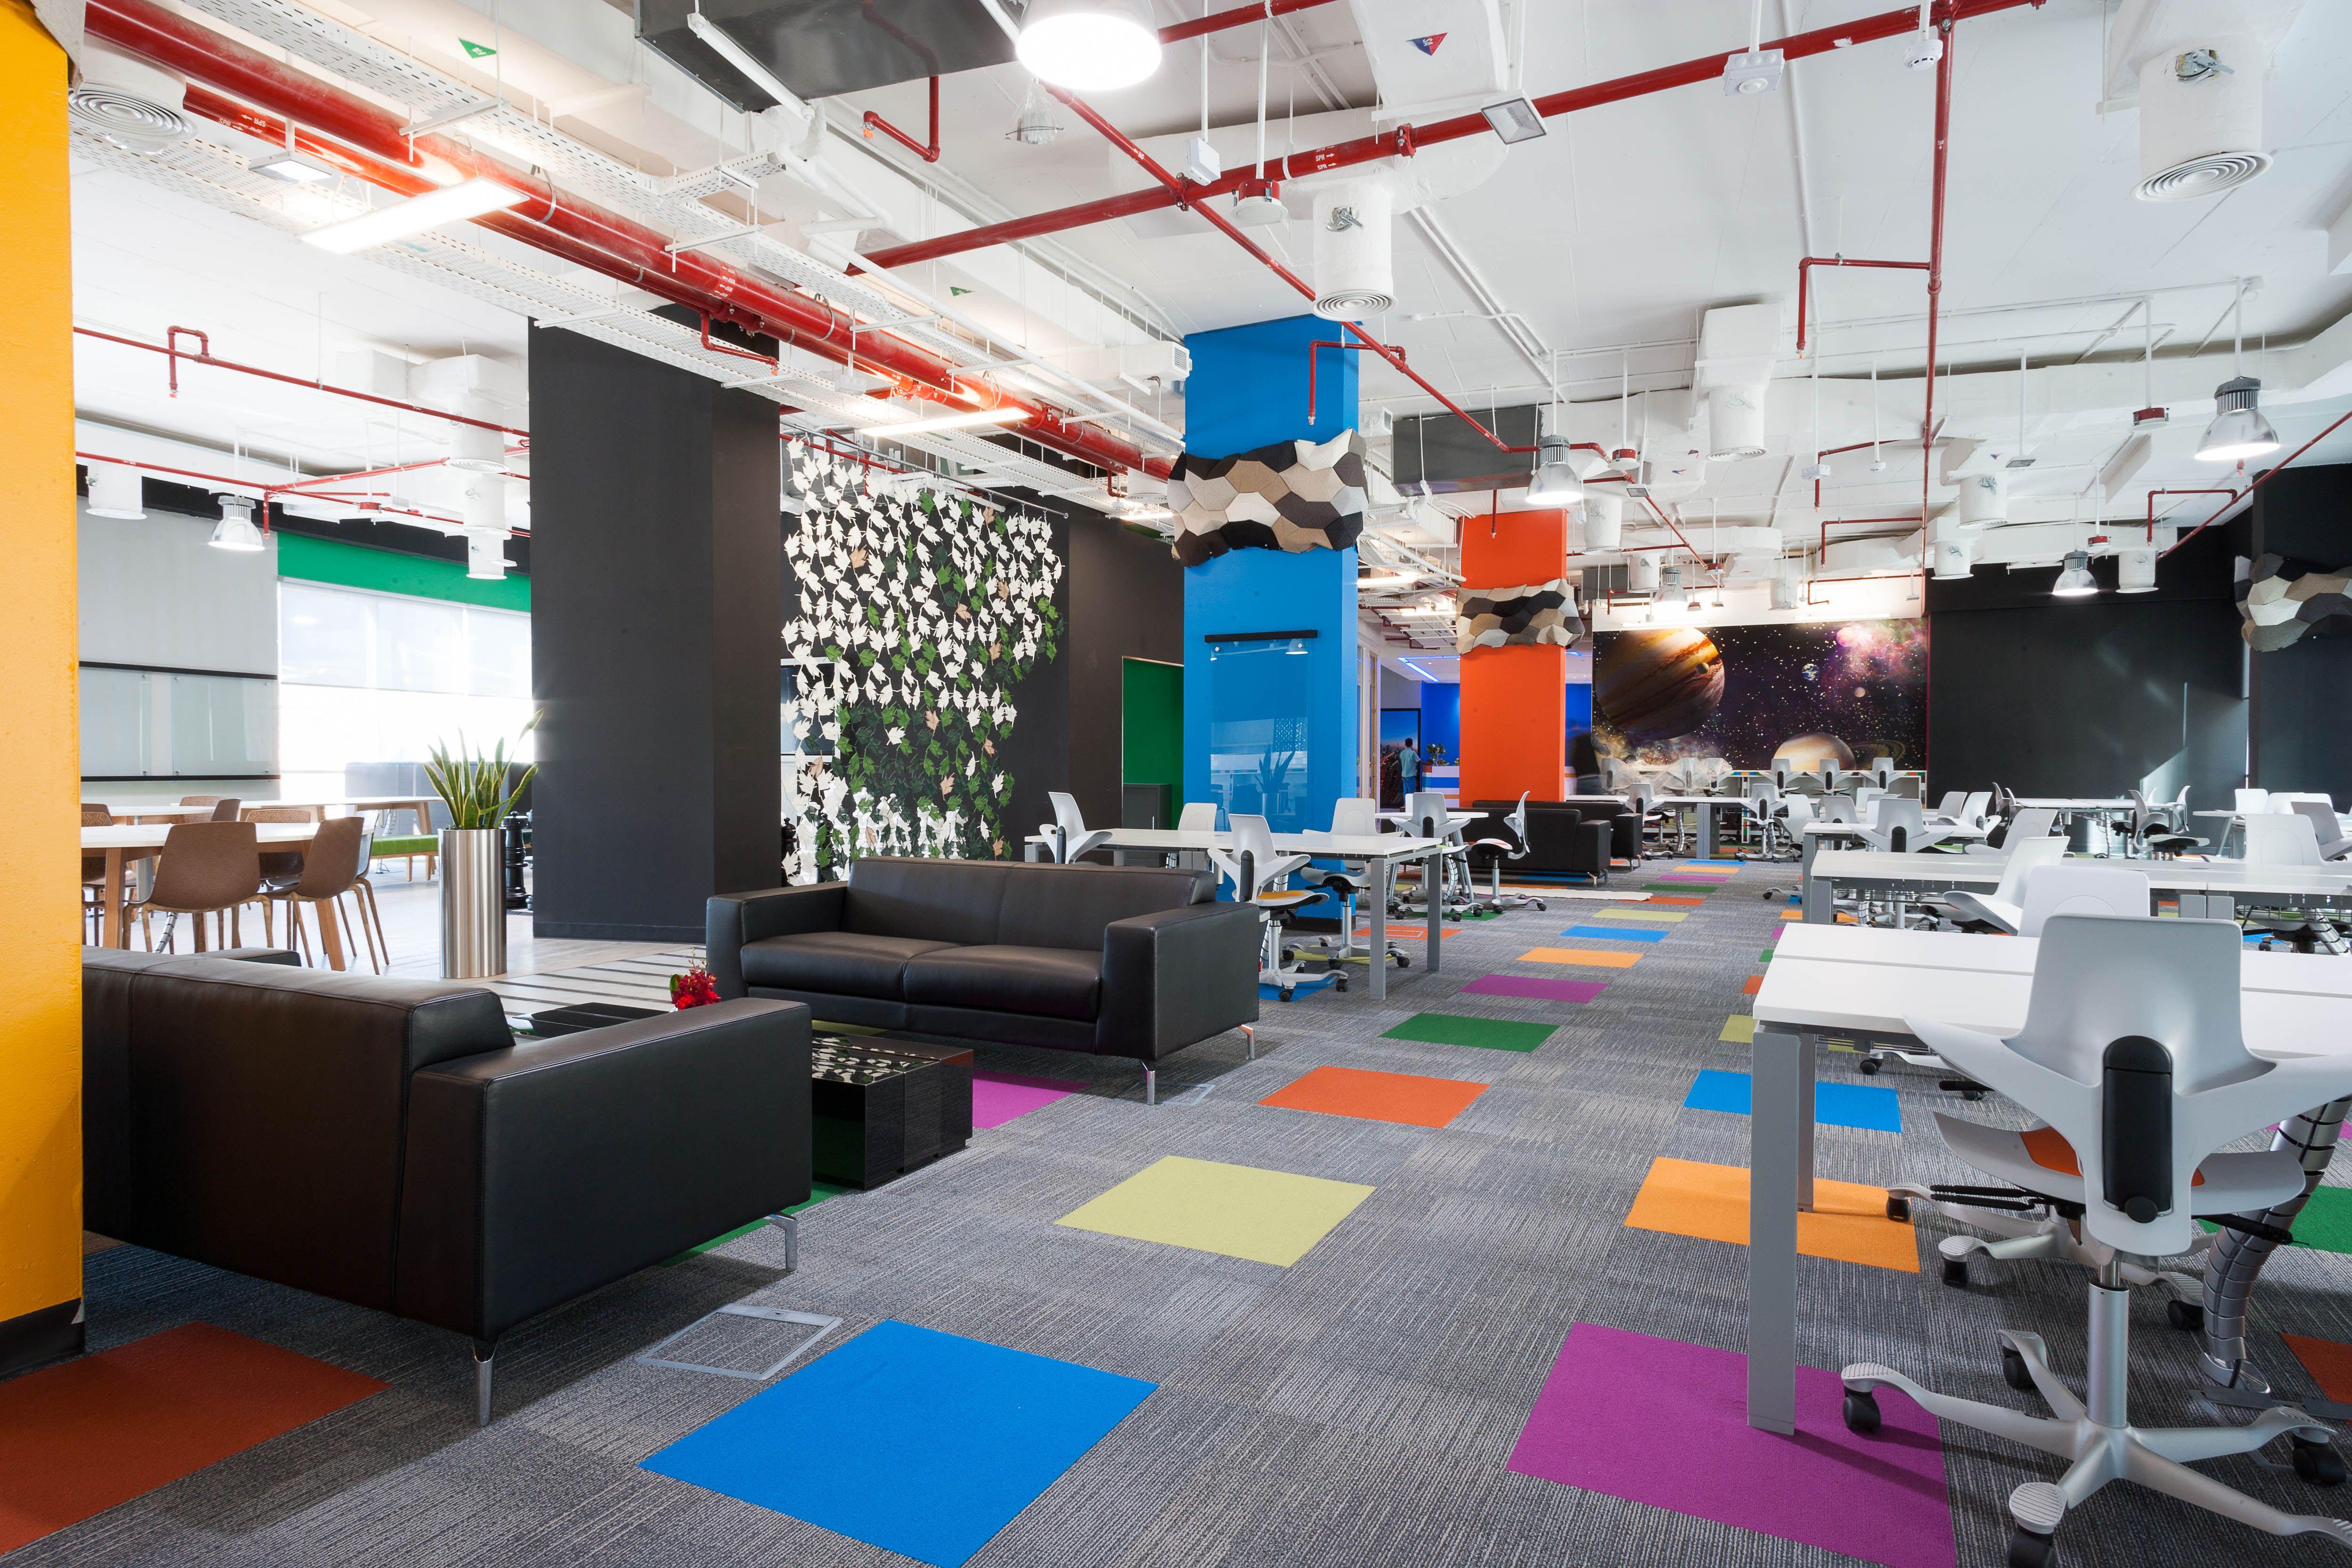 Dubai technology entrepreneur centre dtec in dubai united arab emirates government commercialspaces commercialinteriors design flooring